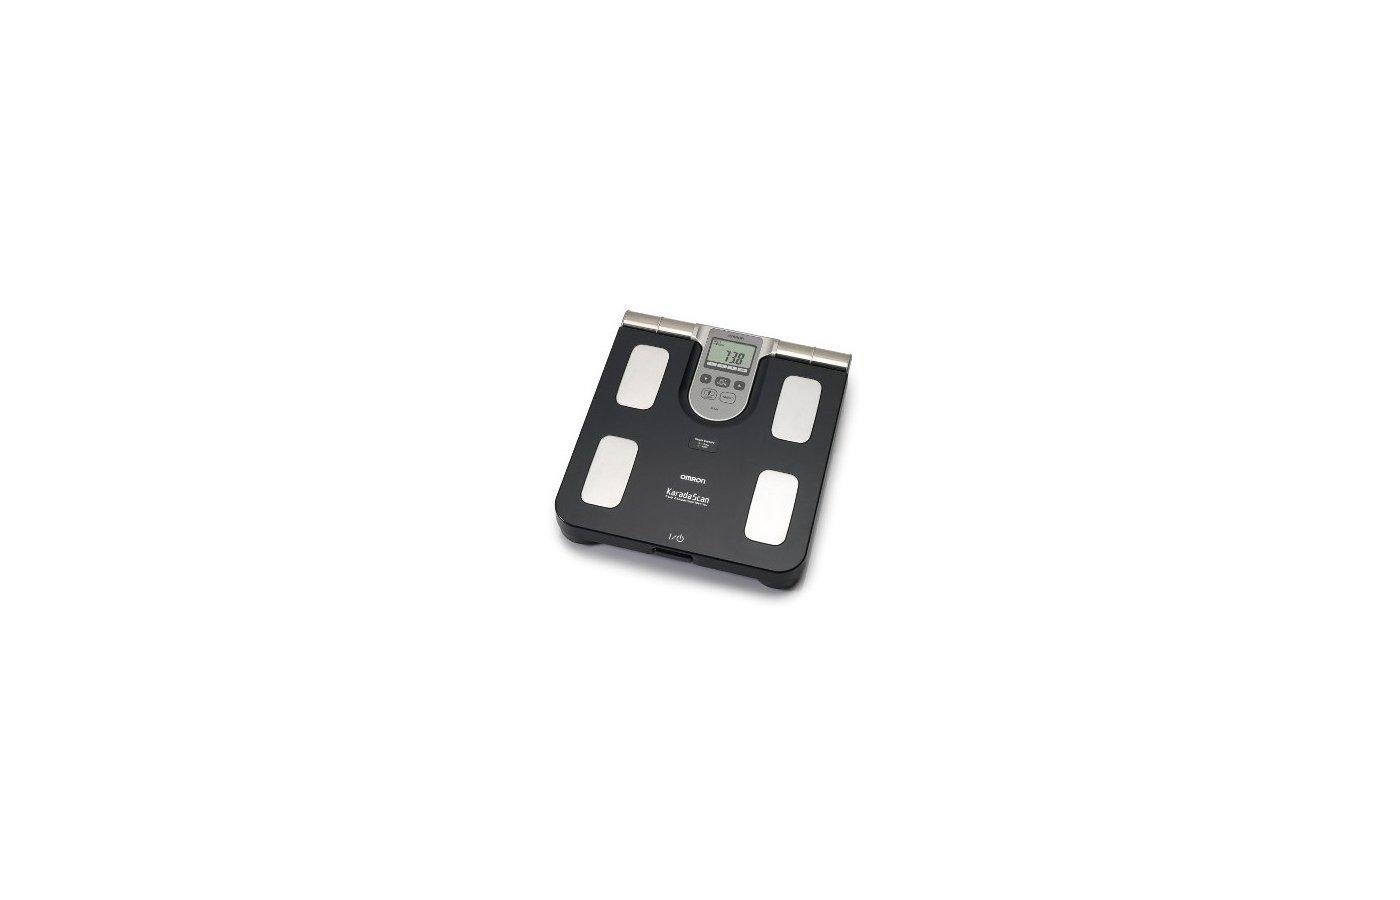 Прочие косметические приборы OMRON BF-508 Монитор состава тела